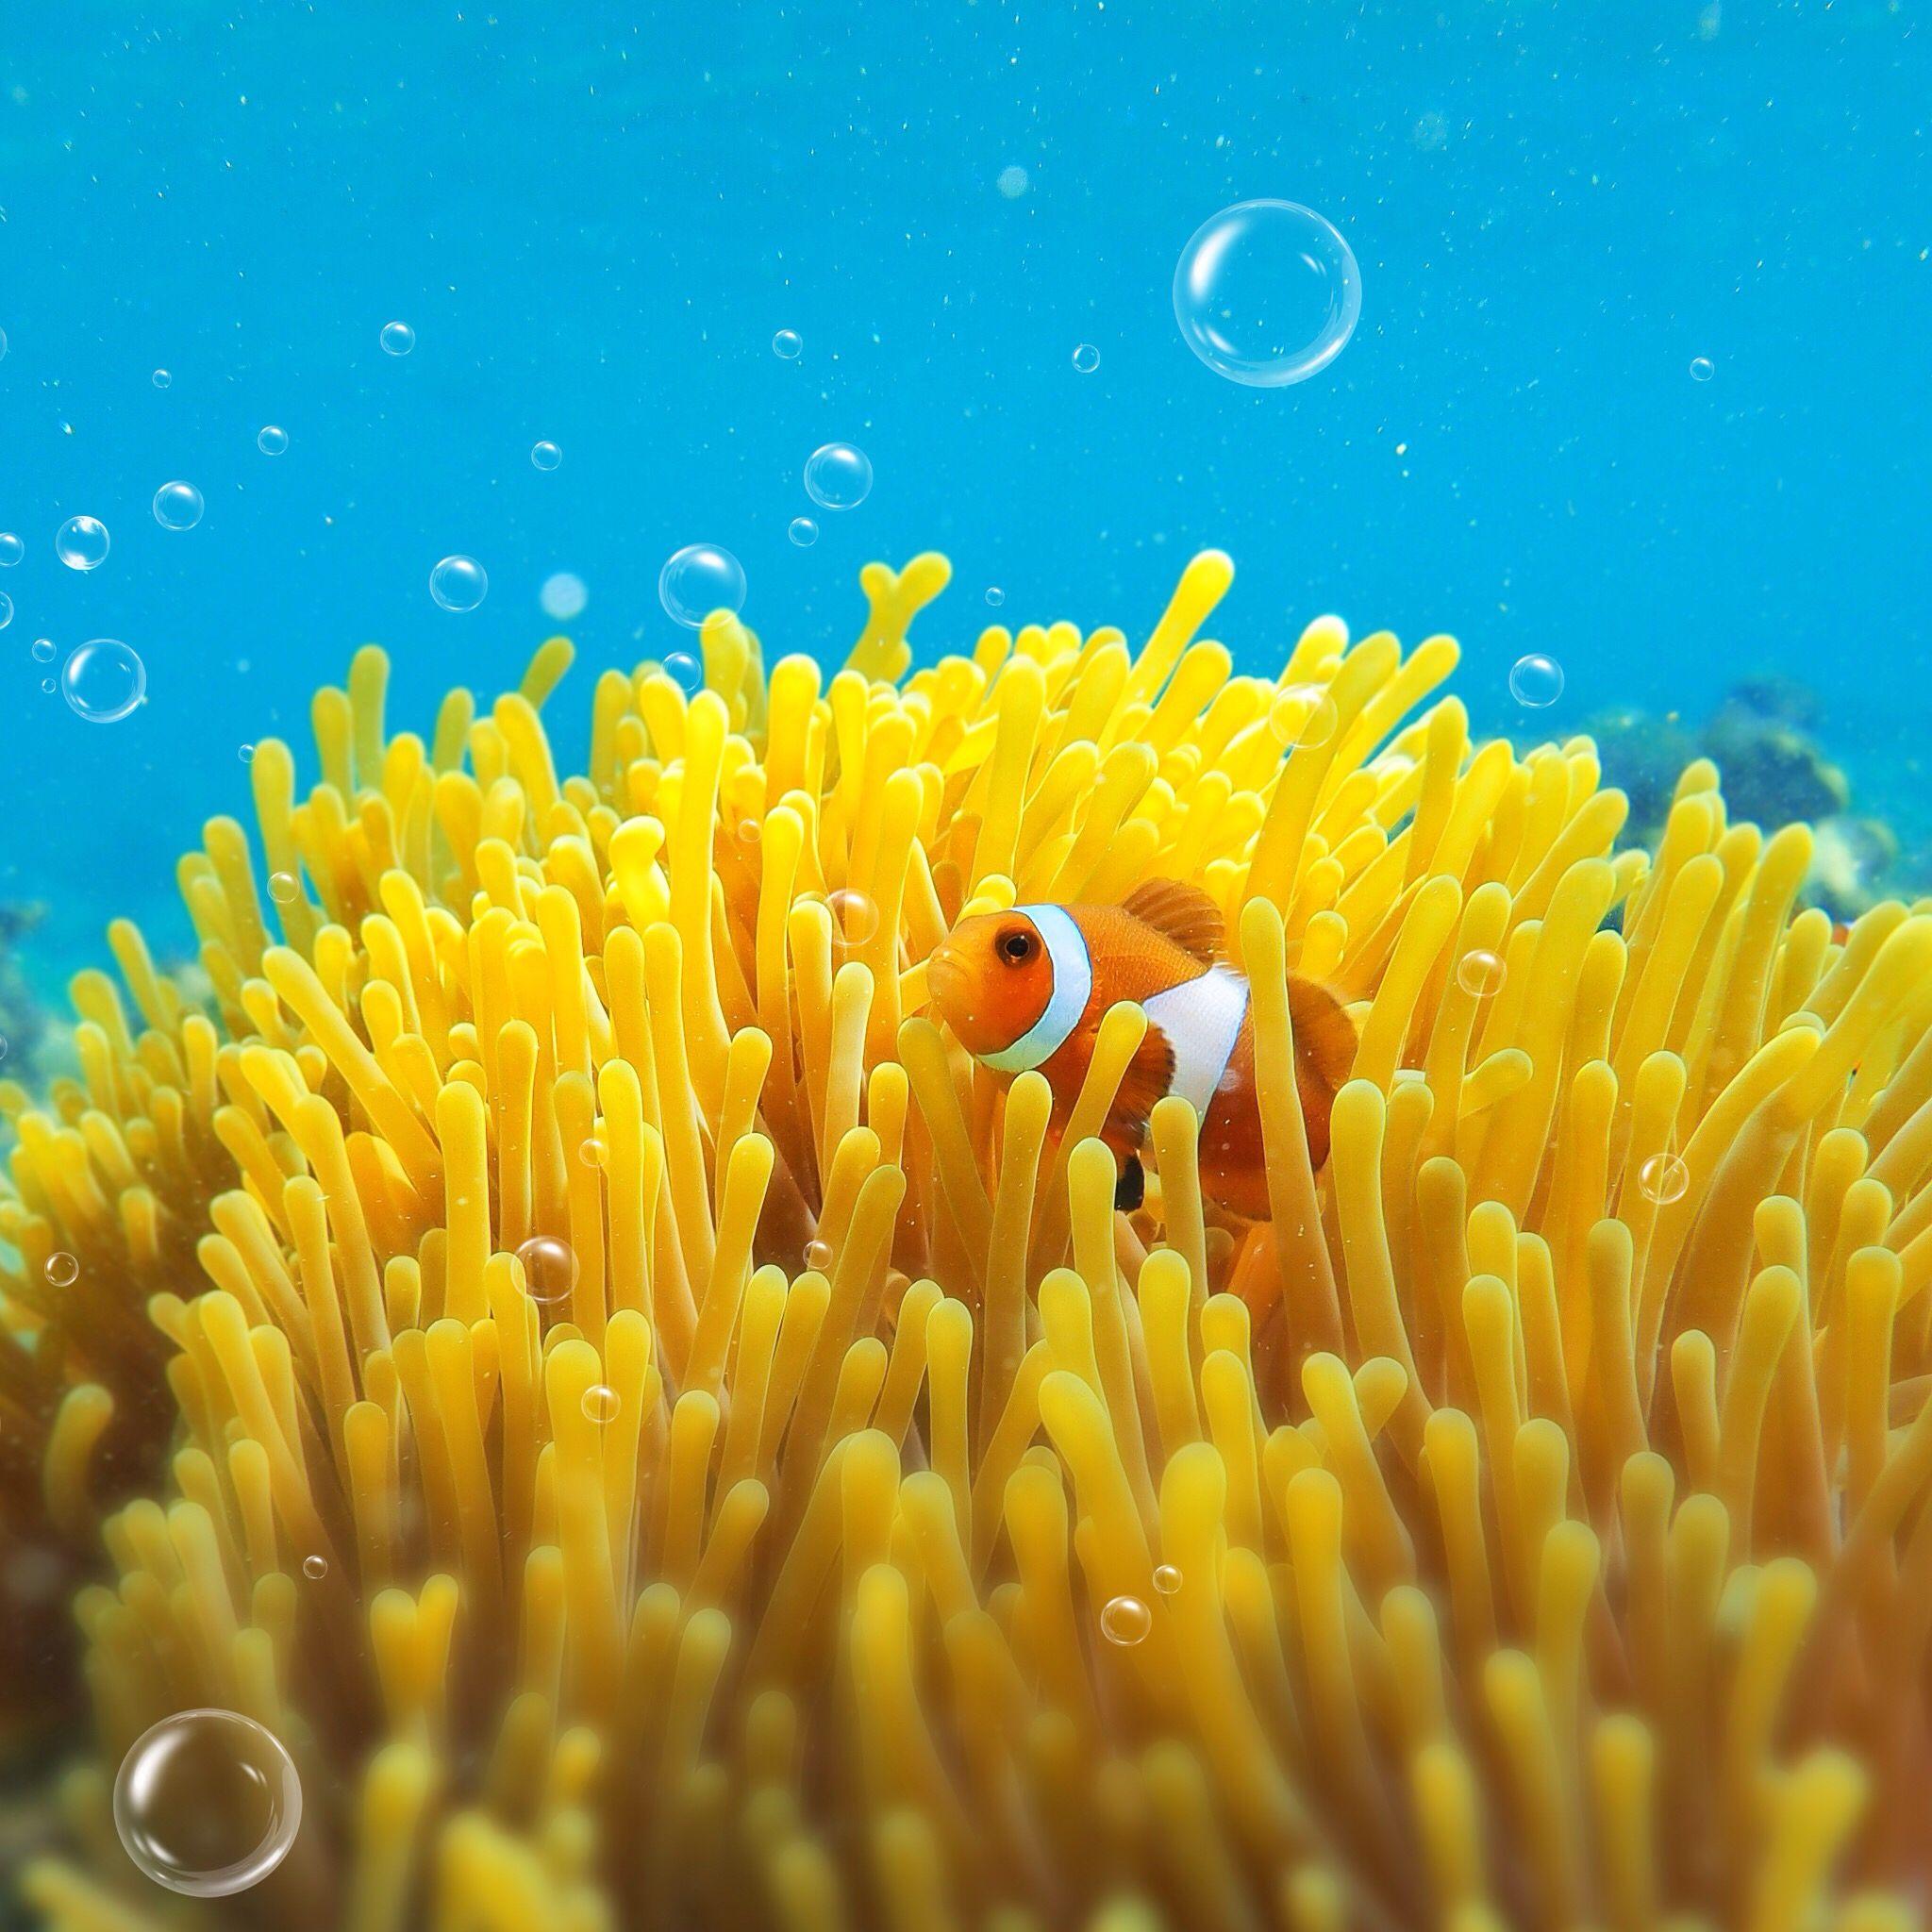 Sea Anemone Iphone Wallpaper Iphone Wallpaper Underwater Wallpaper